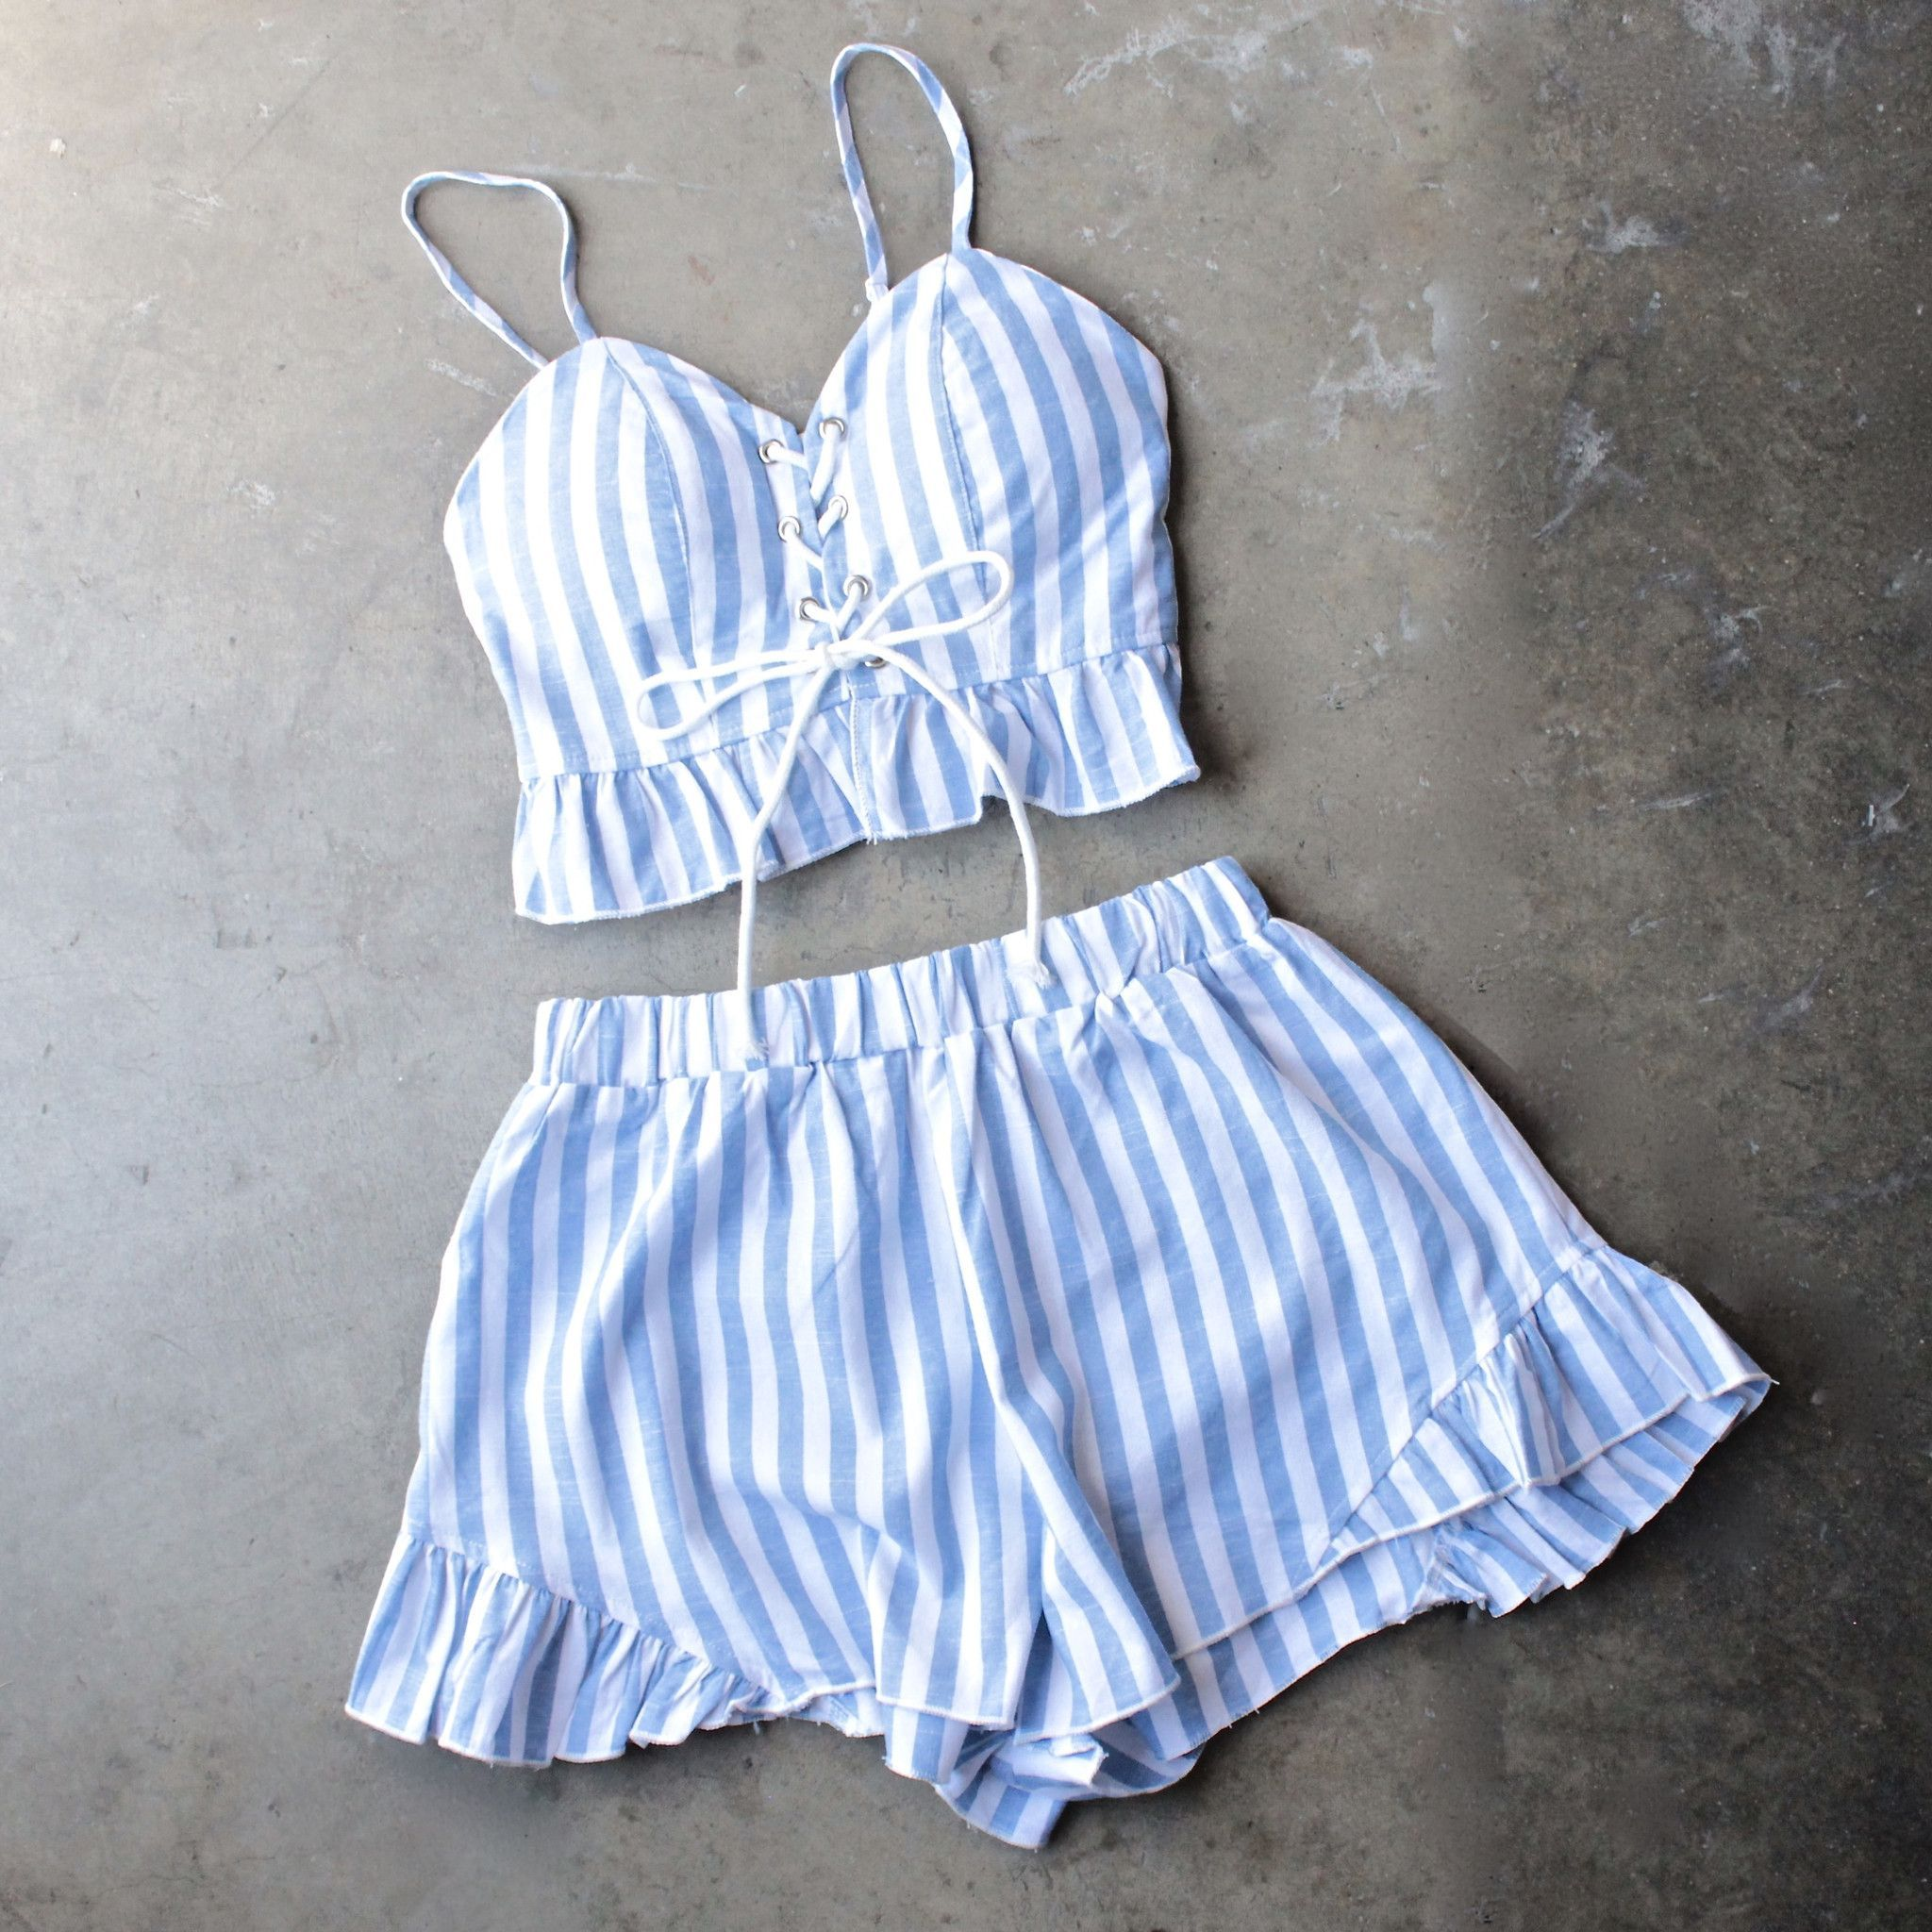 reverse - striped denim blue   white two piece set - shophearts - 1 7f51b8c039f1